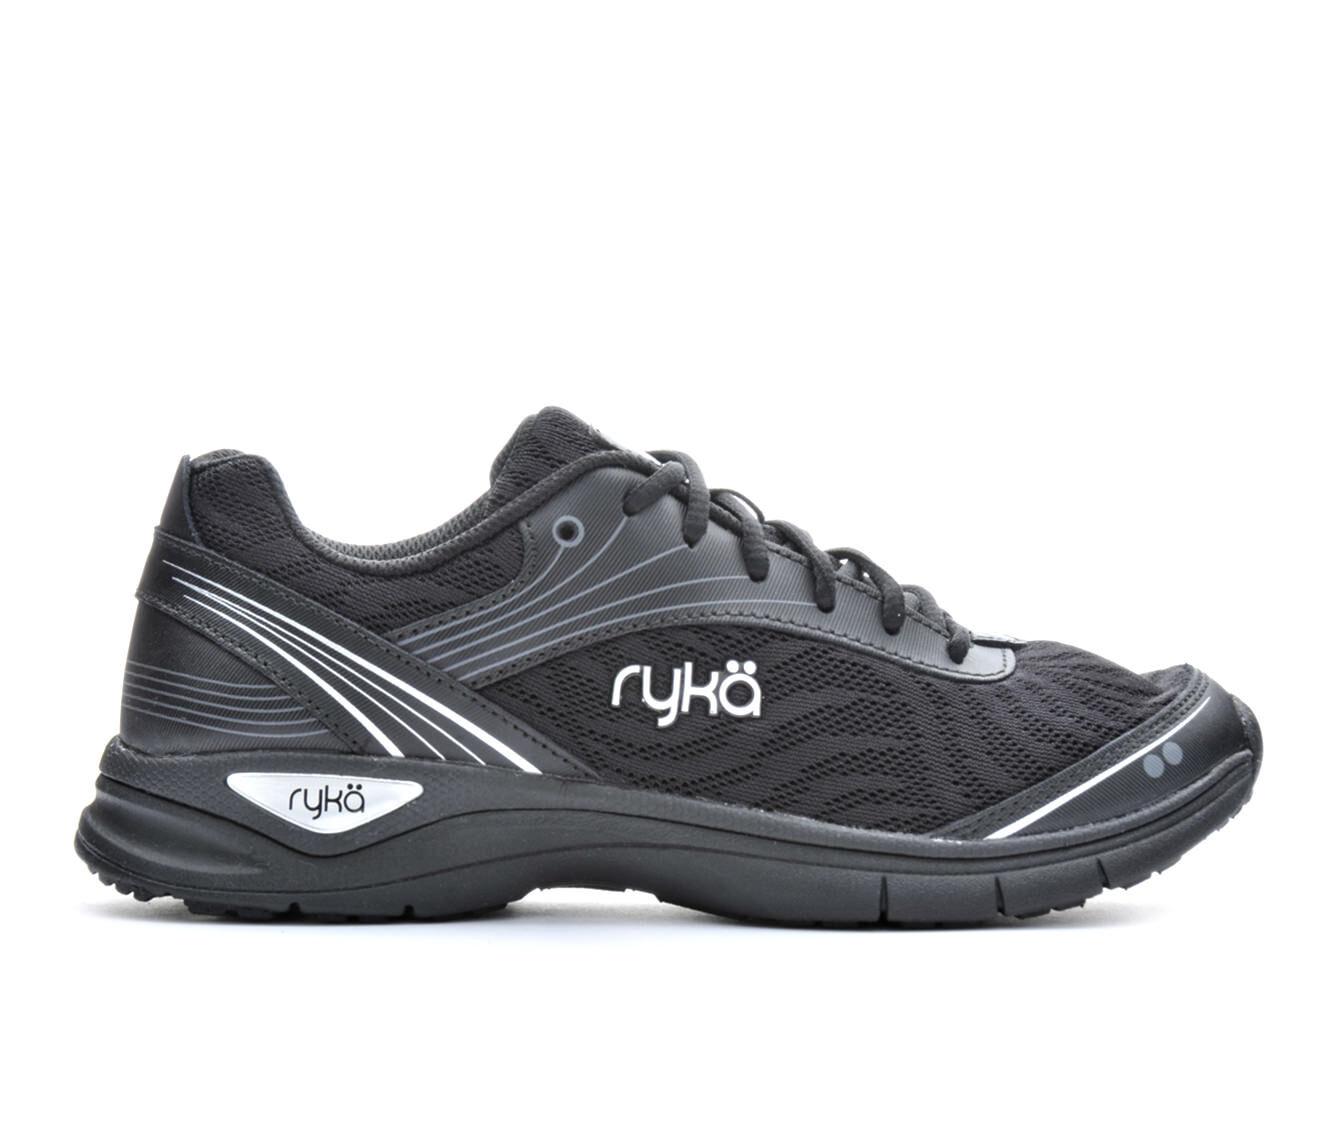 Women's Ryka Regina Walking Shoes cheap sale low price fee shipping sale free shipping shopping online free shipping cheap real cheap sale recommend ttVWSk